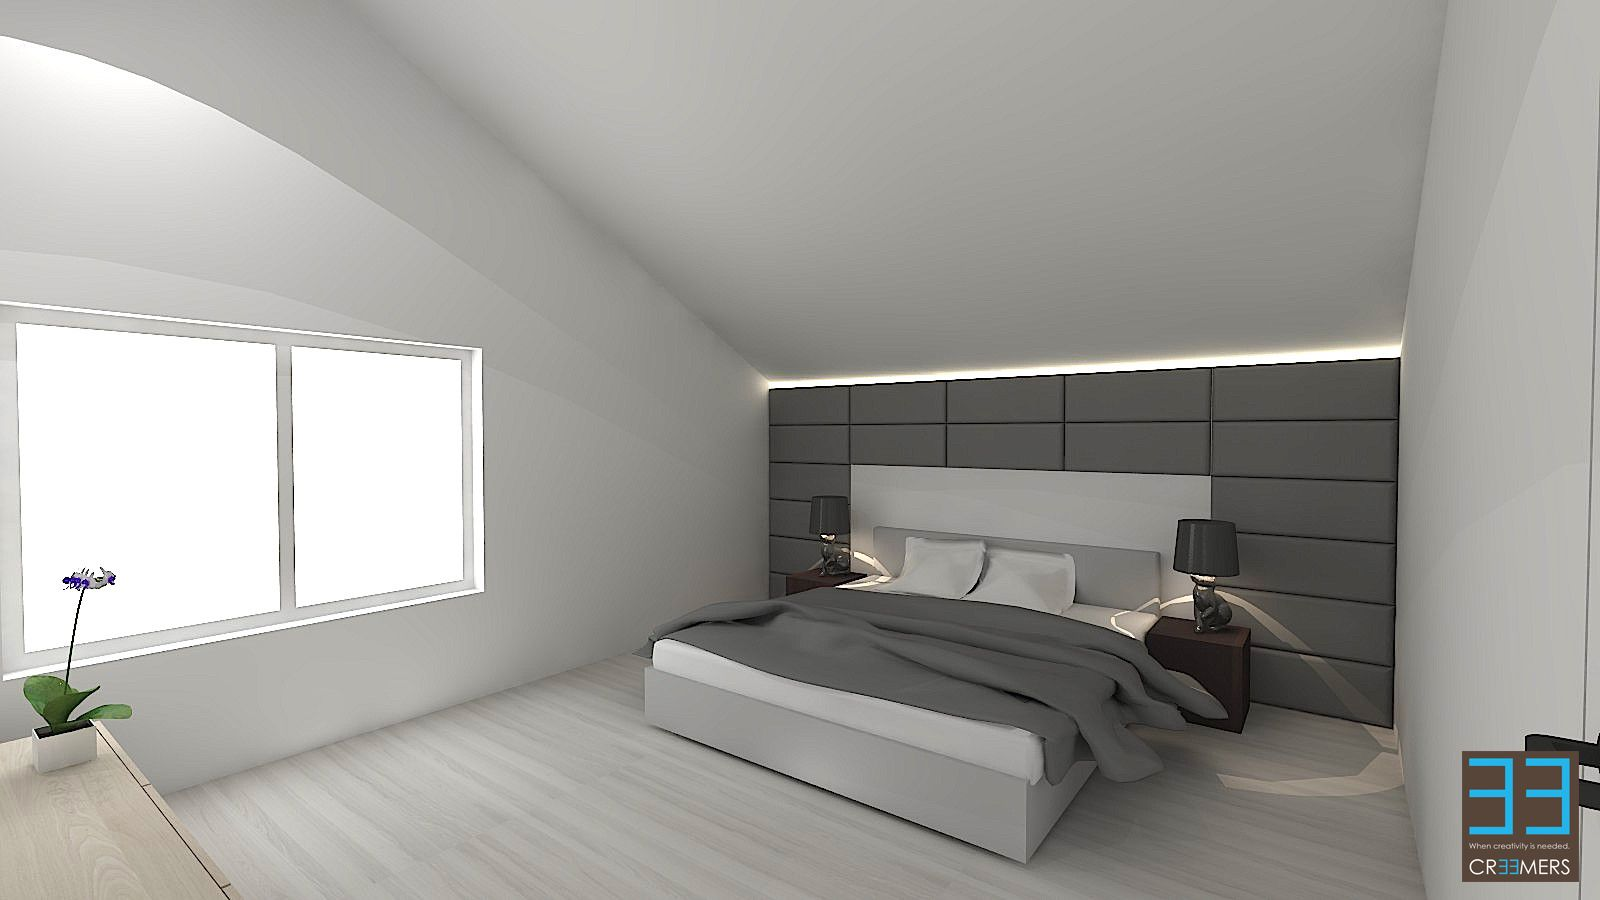 Slaapkamer achterwand beter slaapkamer achterwand ideeen quant i